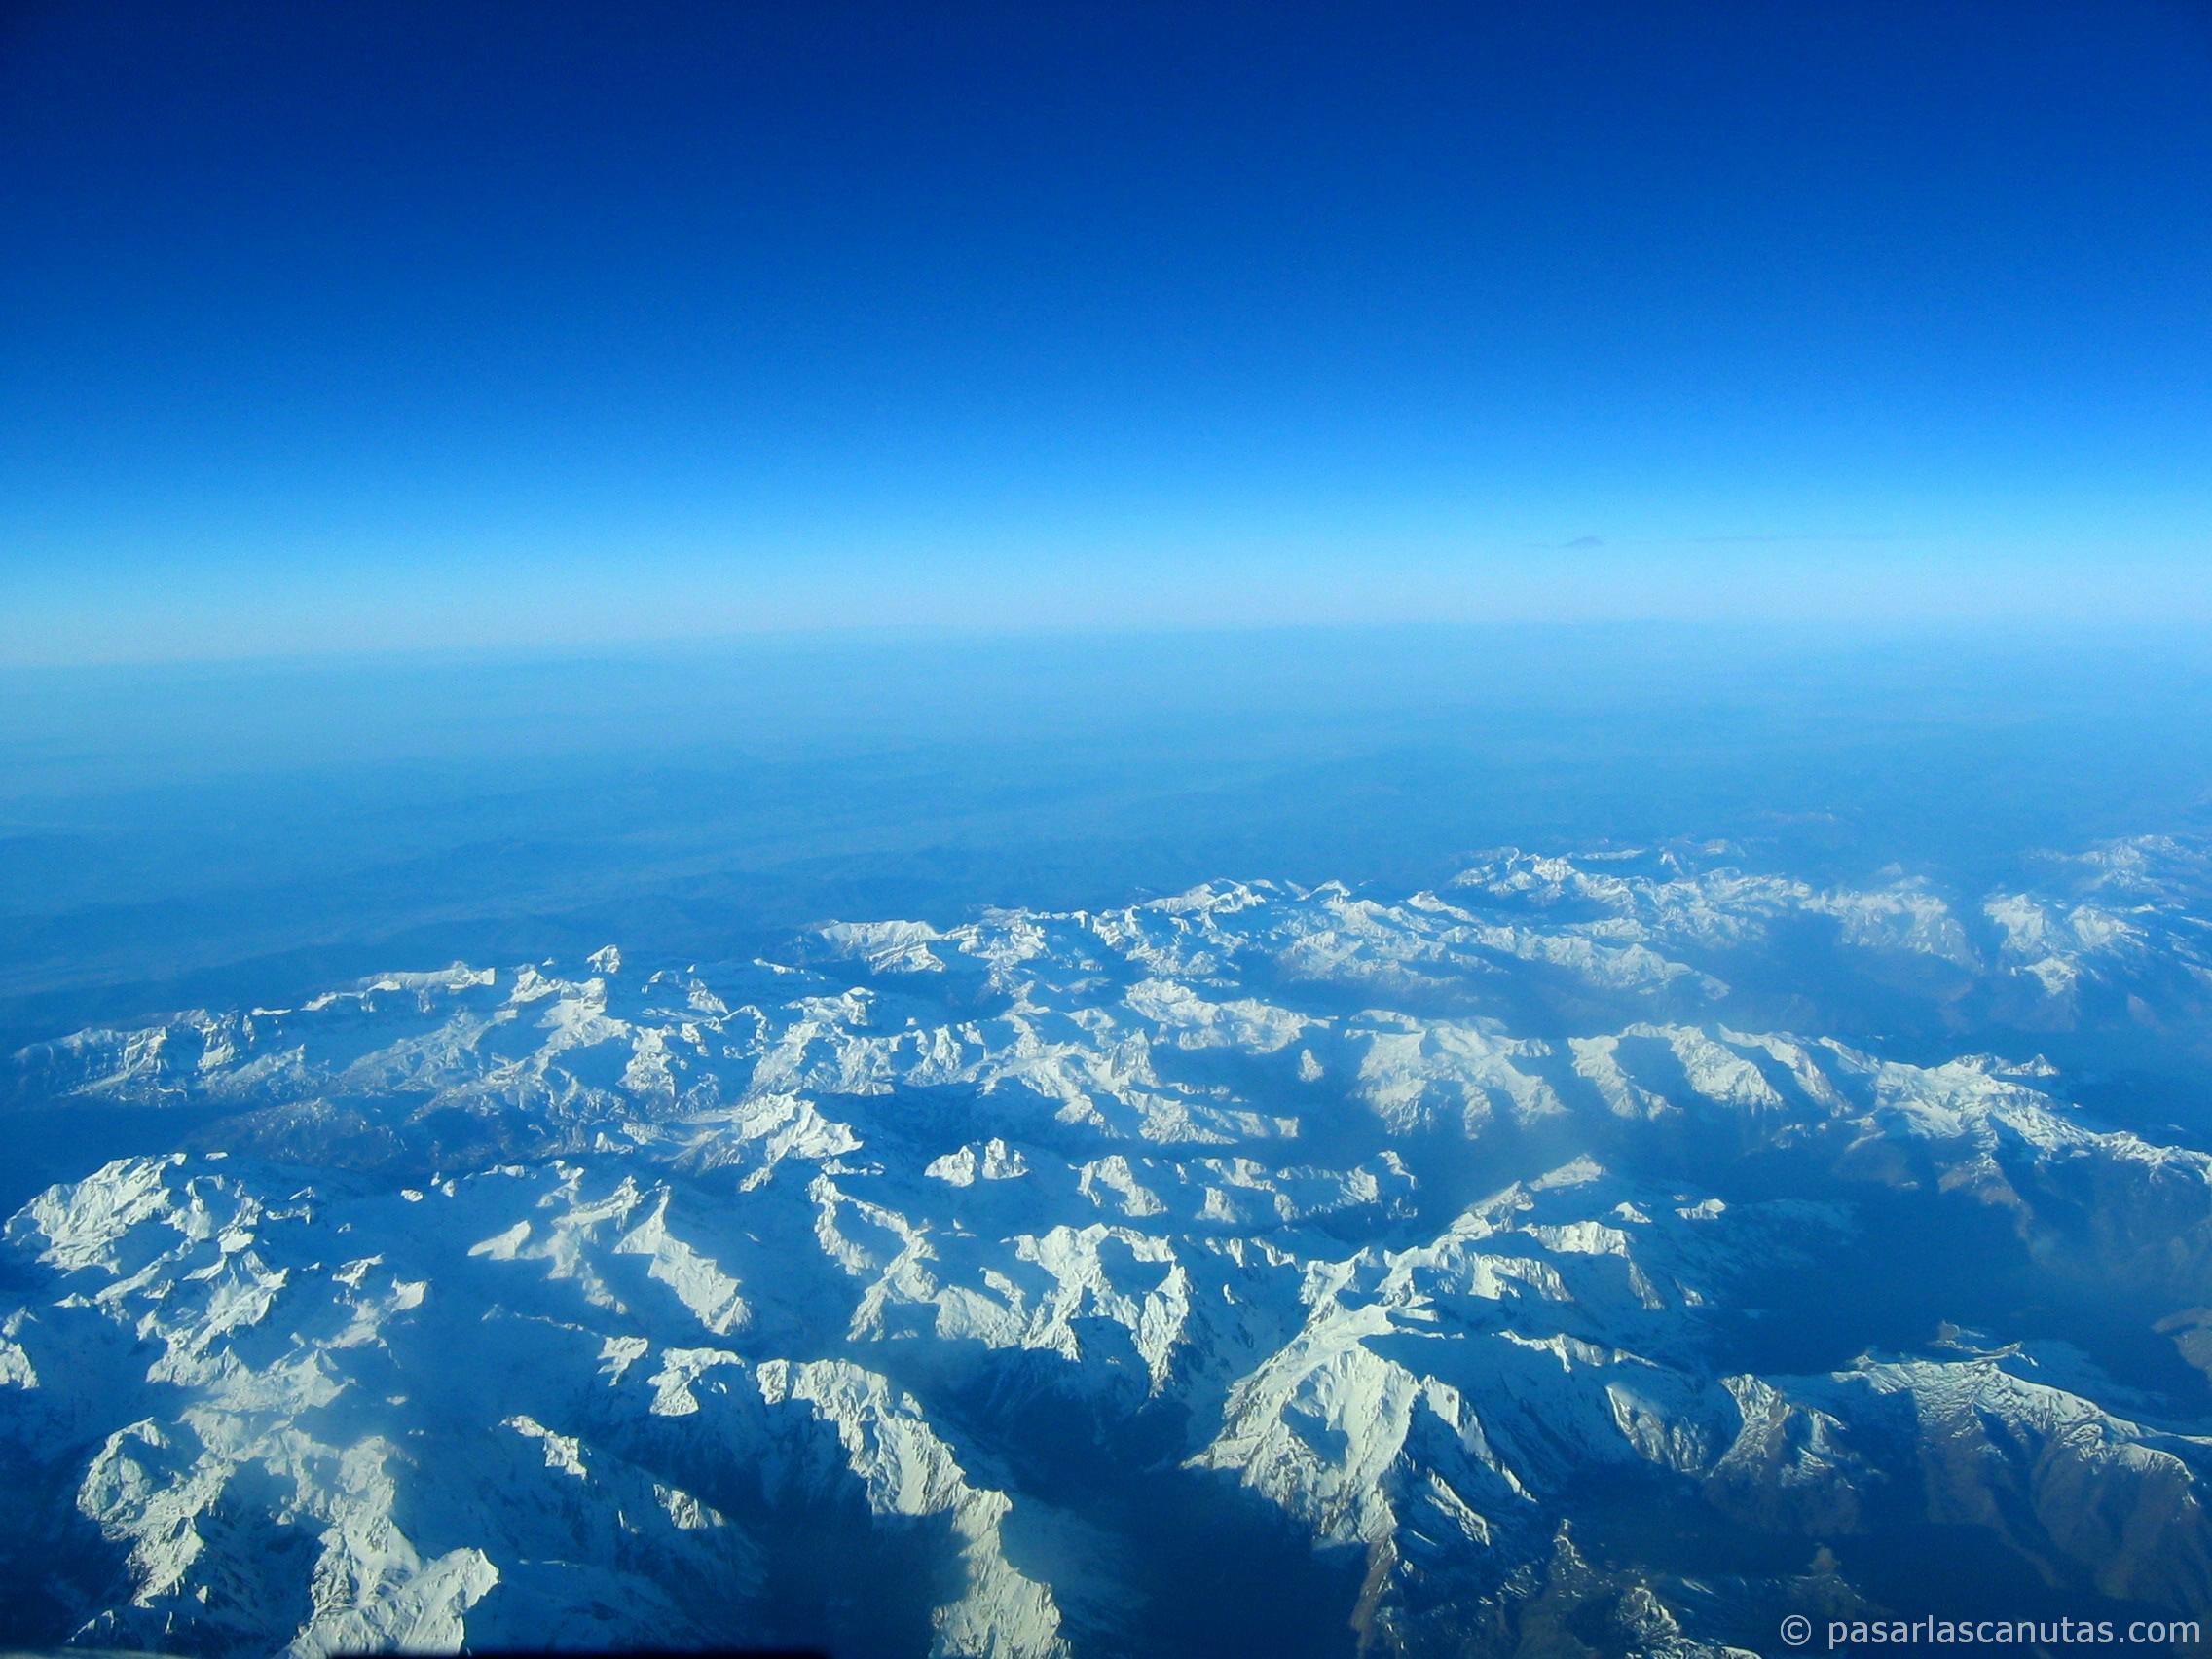 Los mejores paisajes alta definicion taringa for Fondos de pantalla de aviones